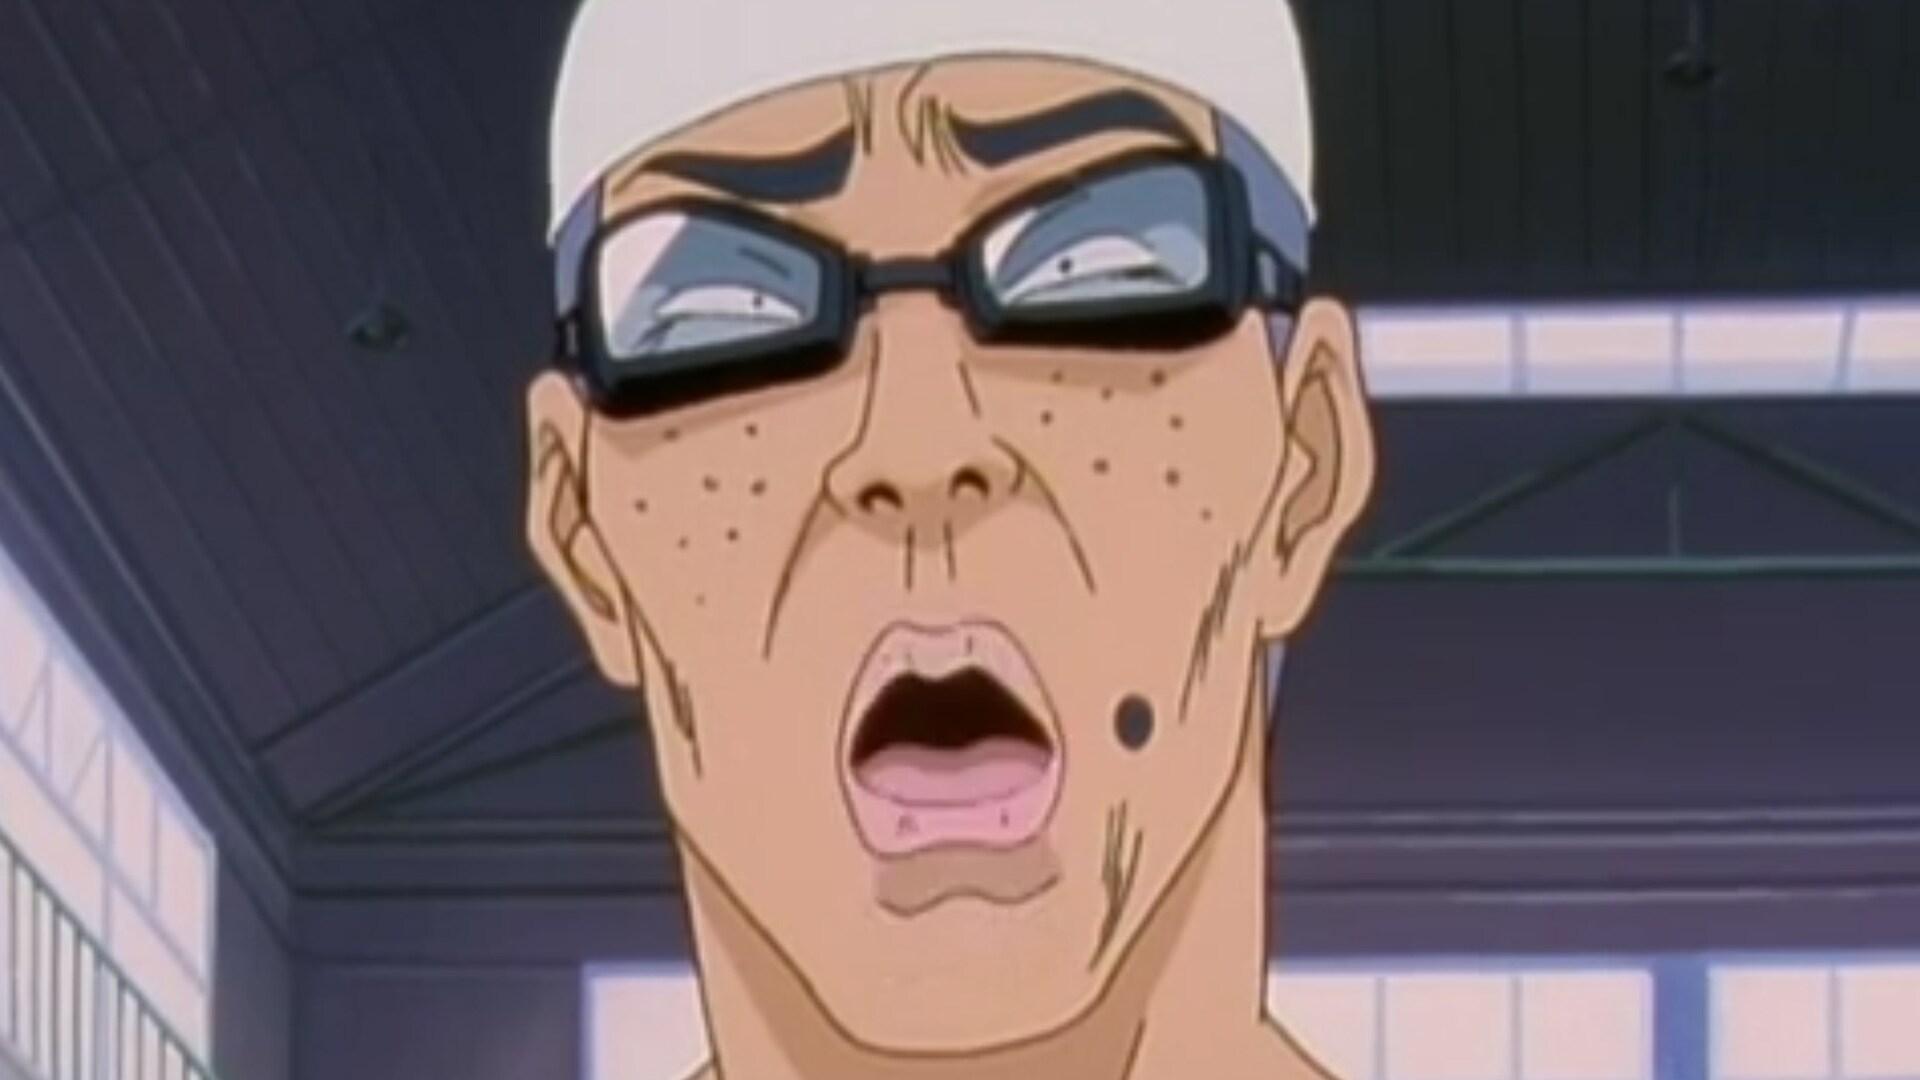 Onizuka and the Art of War